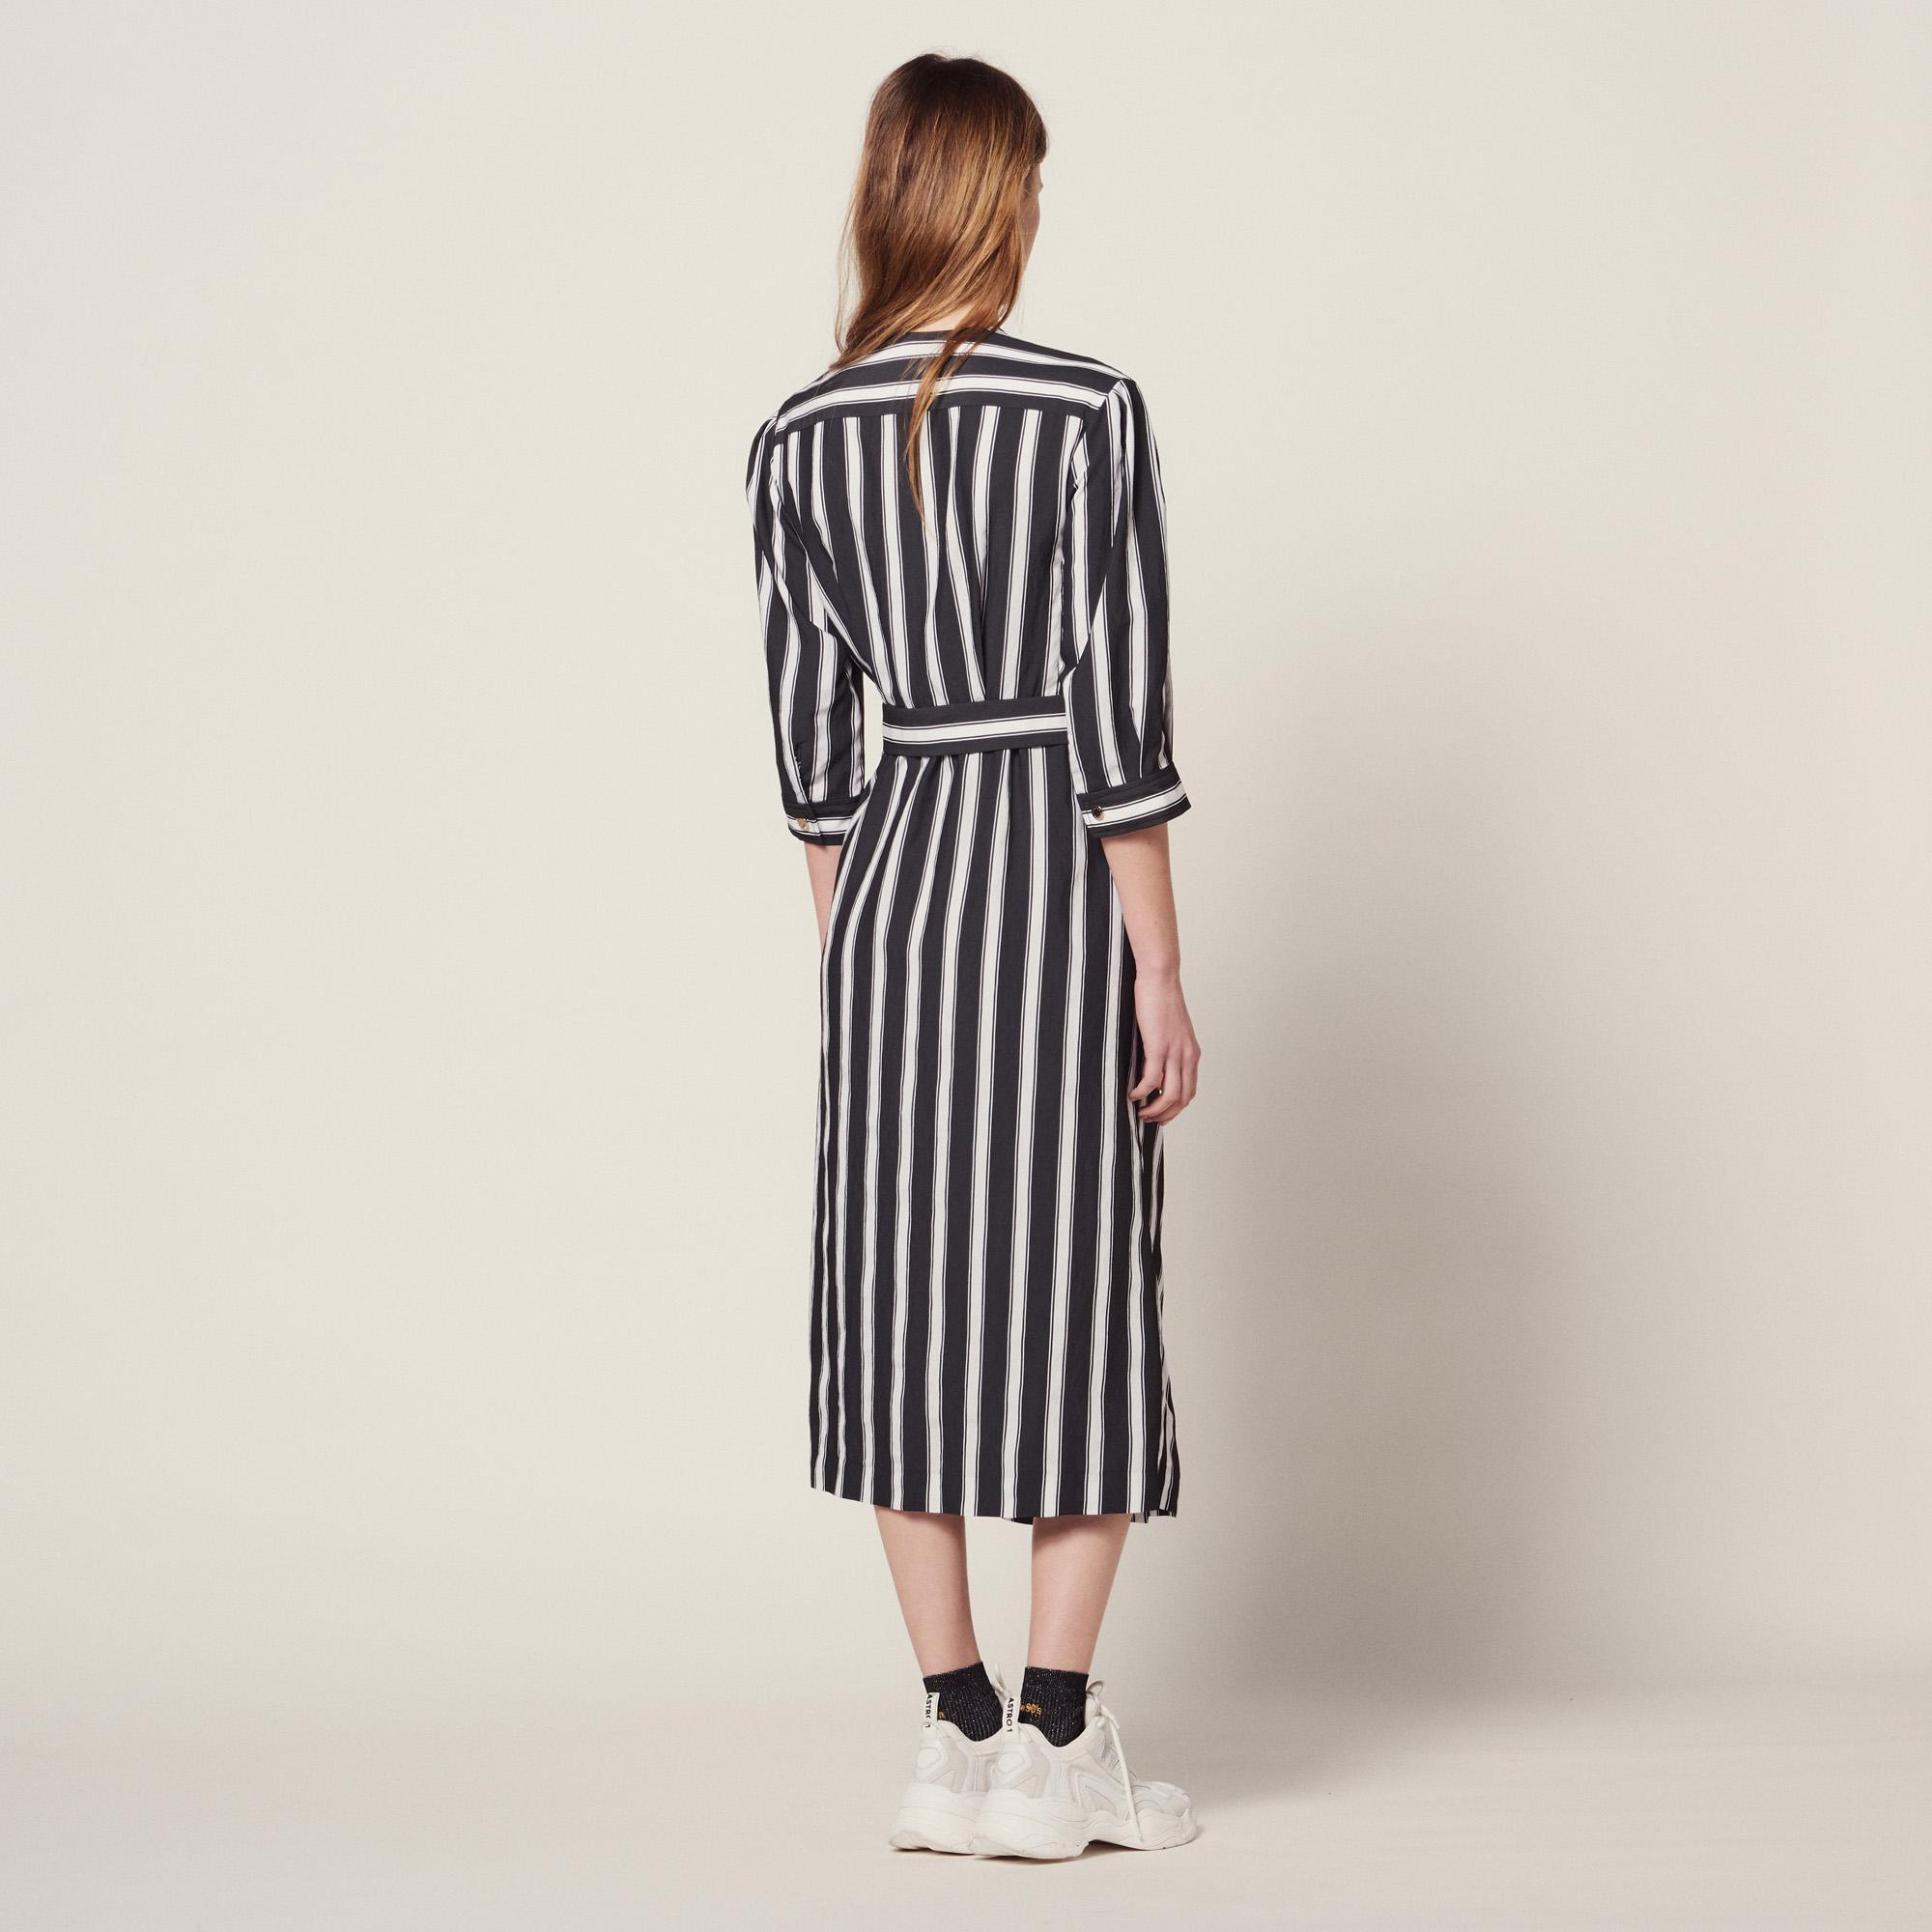 dbda96672d6 ... Midi Dress With Contrasting Stripes   Dresses color Black ...